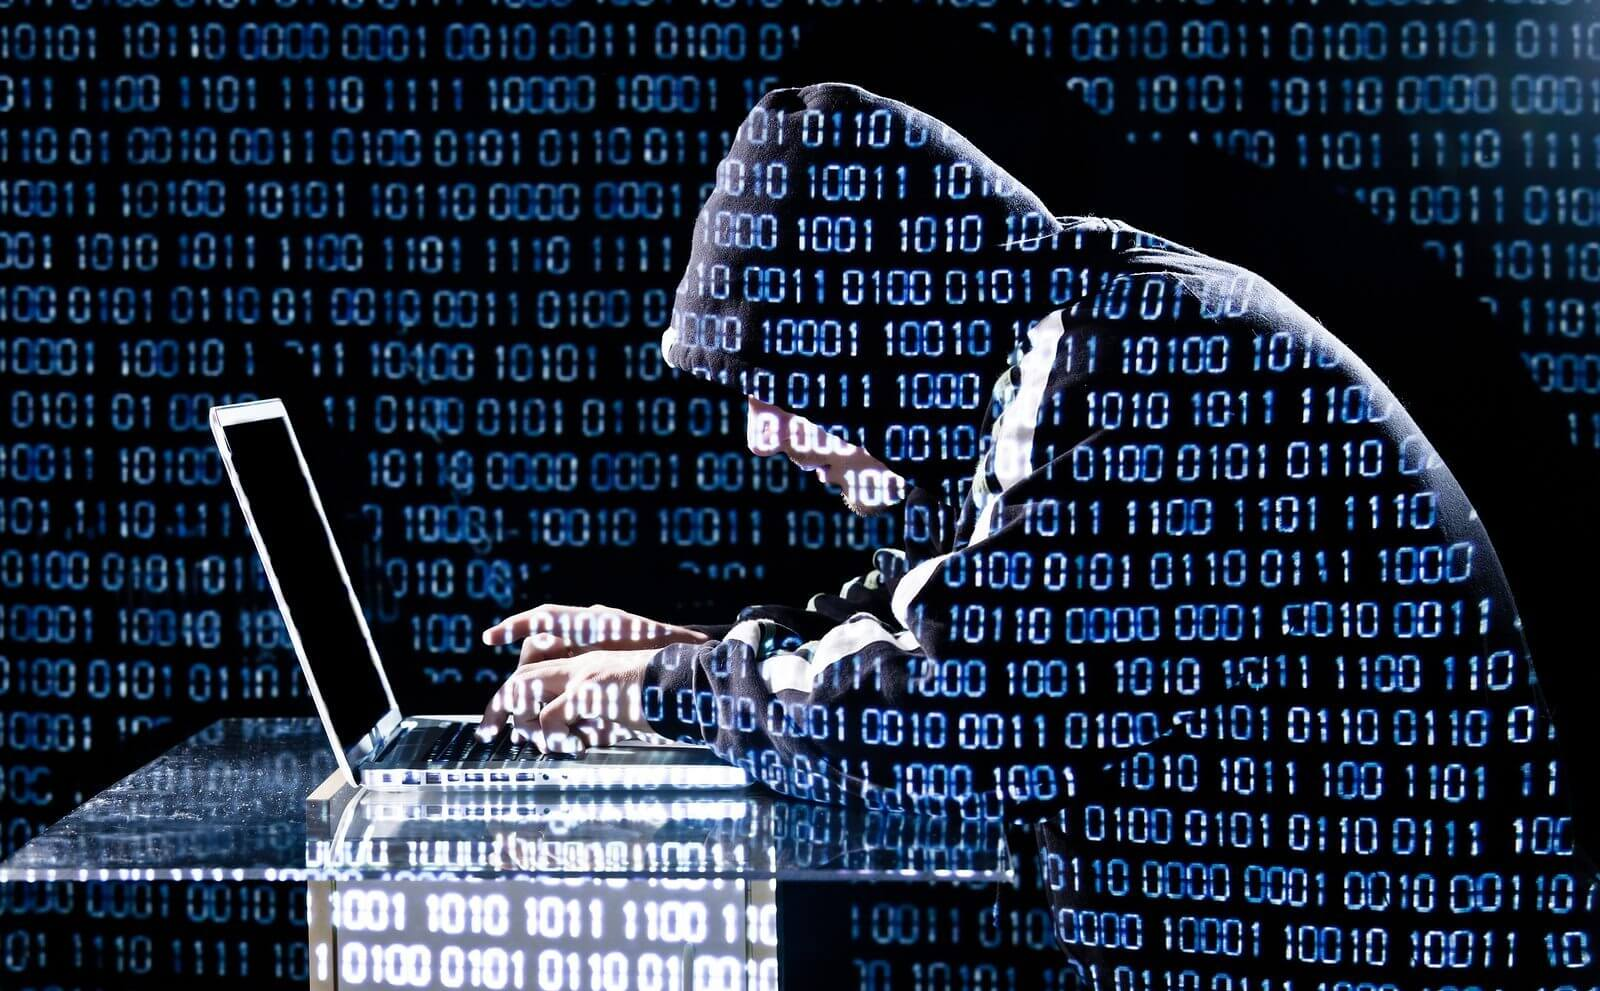 windows 10 hacker falha applocker - Falha no Windows inutiliza ferramenta de segurança do sistema